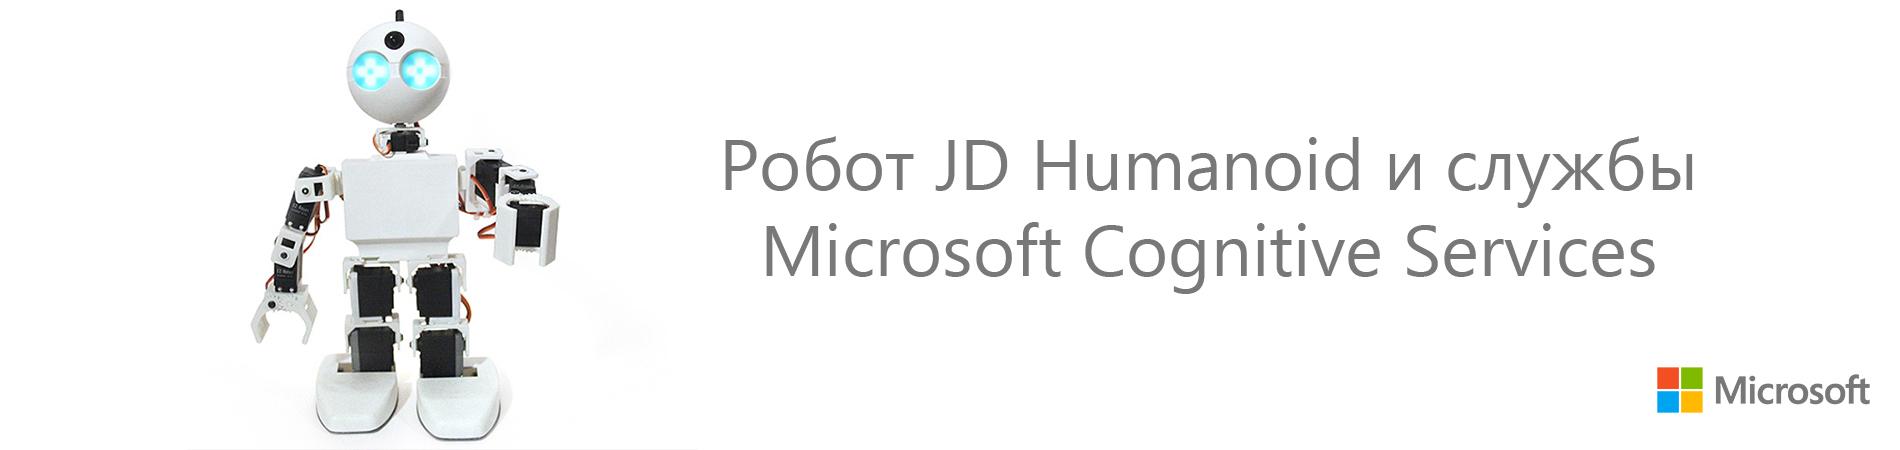 Робот JD Humanoid и службы Microsoft Cognitive Services